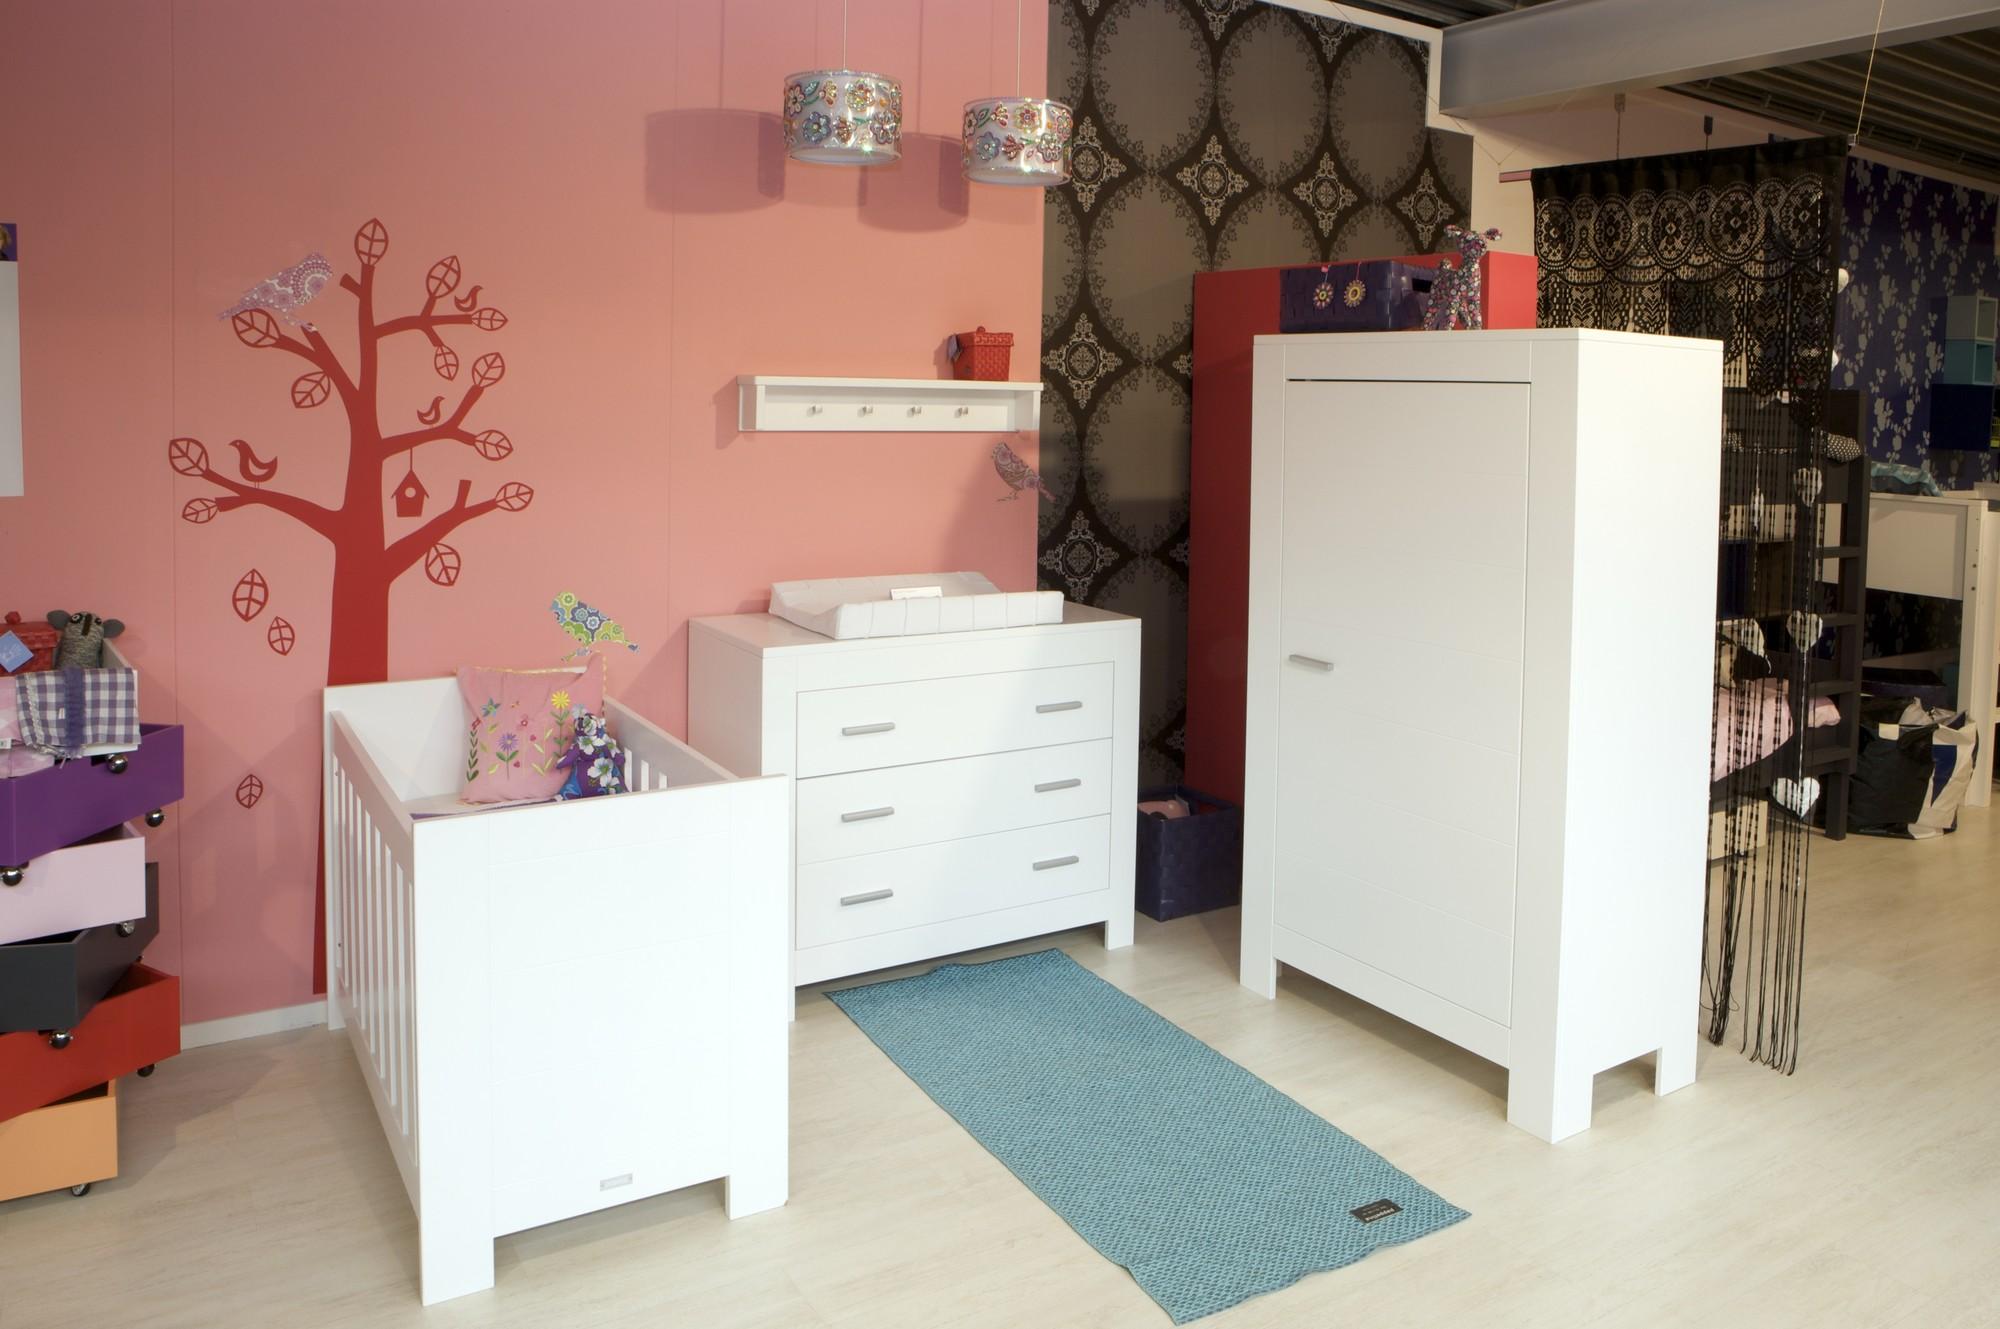 Babykamer Bopita Ideeen : Babykamer babyplanet babykamers online babykamer kopen babyplanet